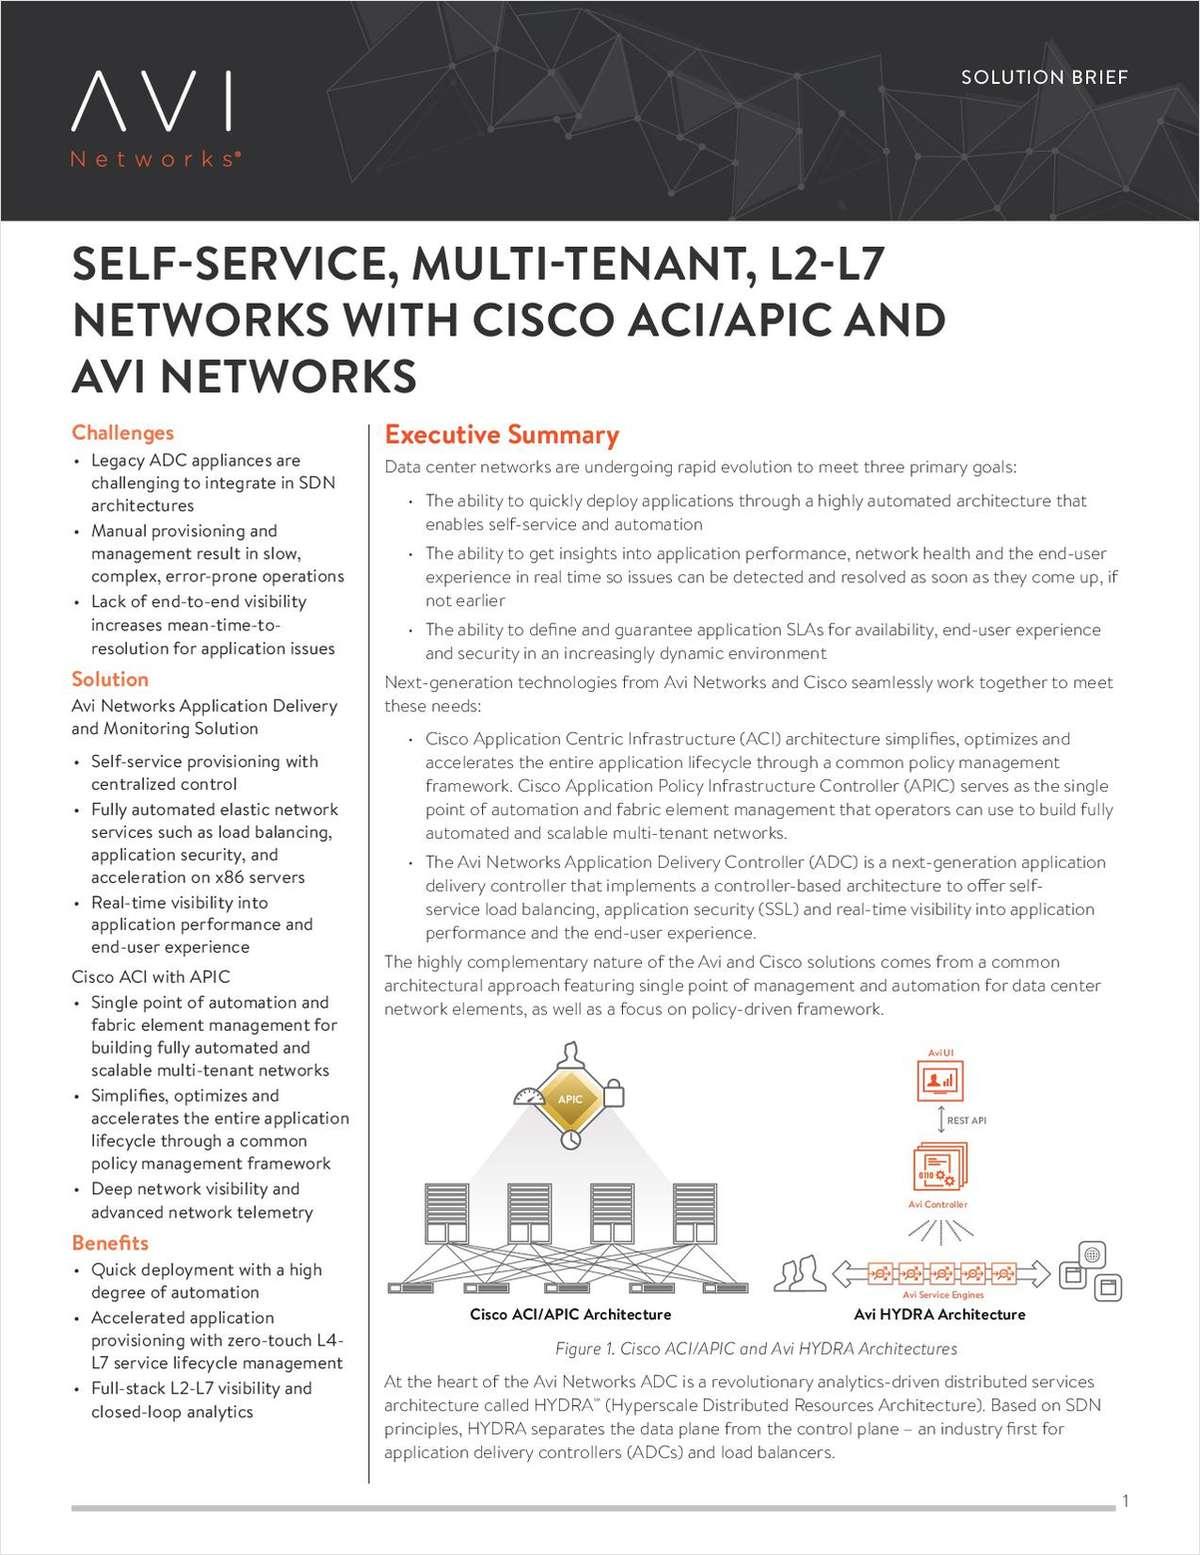 Self-Service, Multi-Tenant, L2-L7 Networks